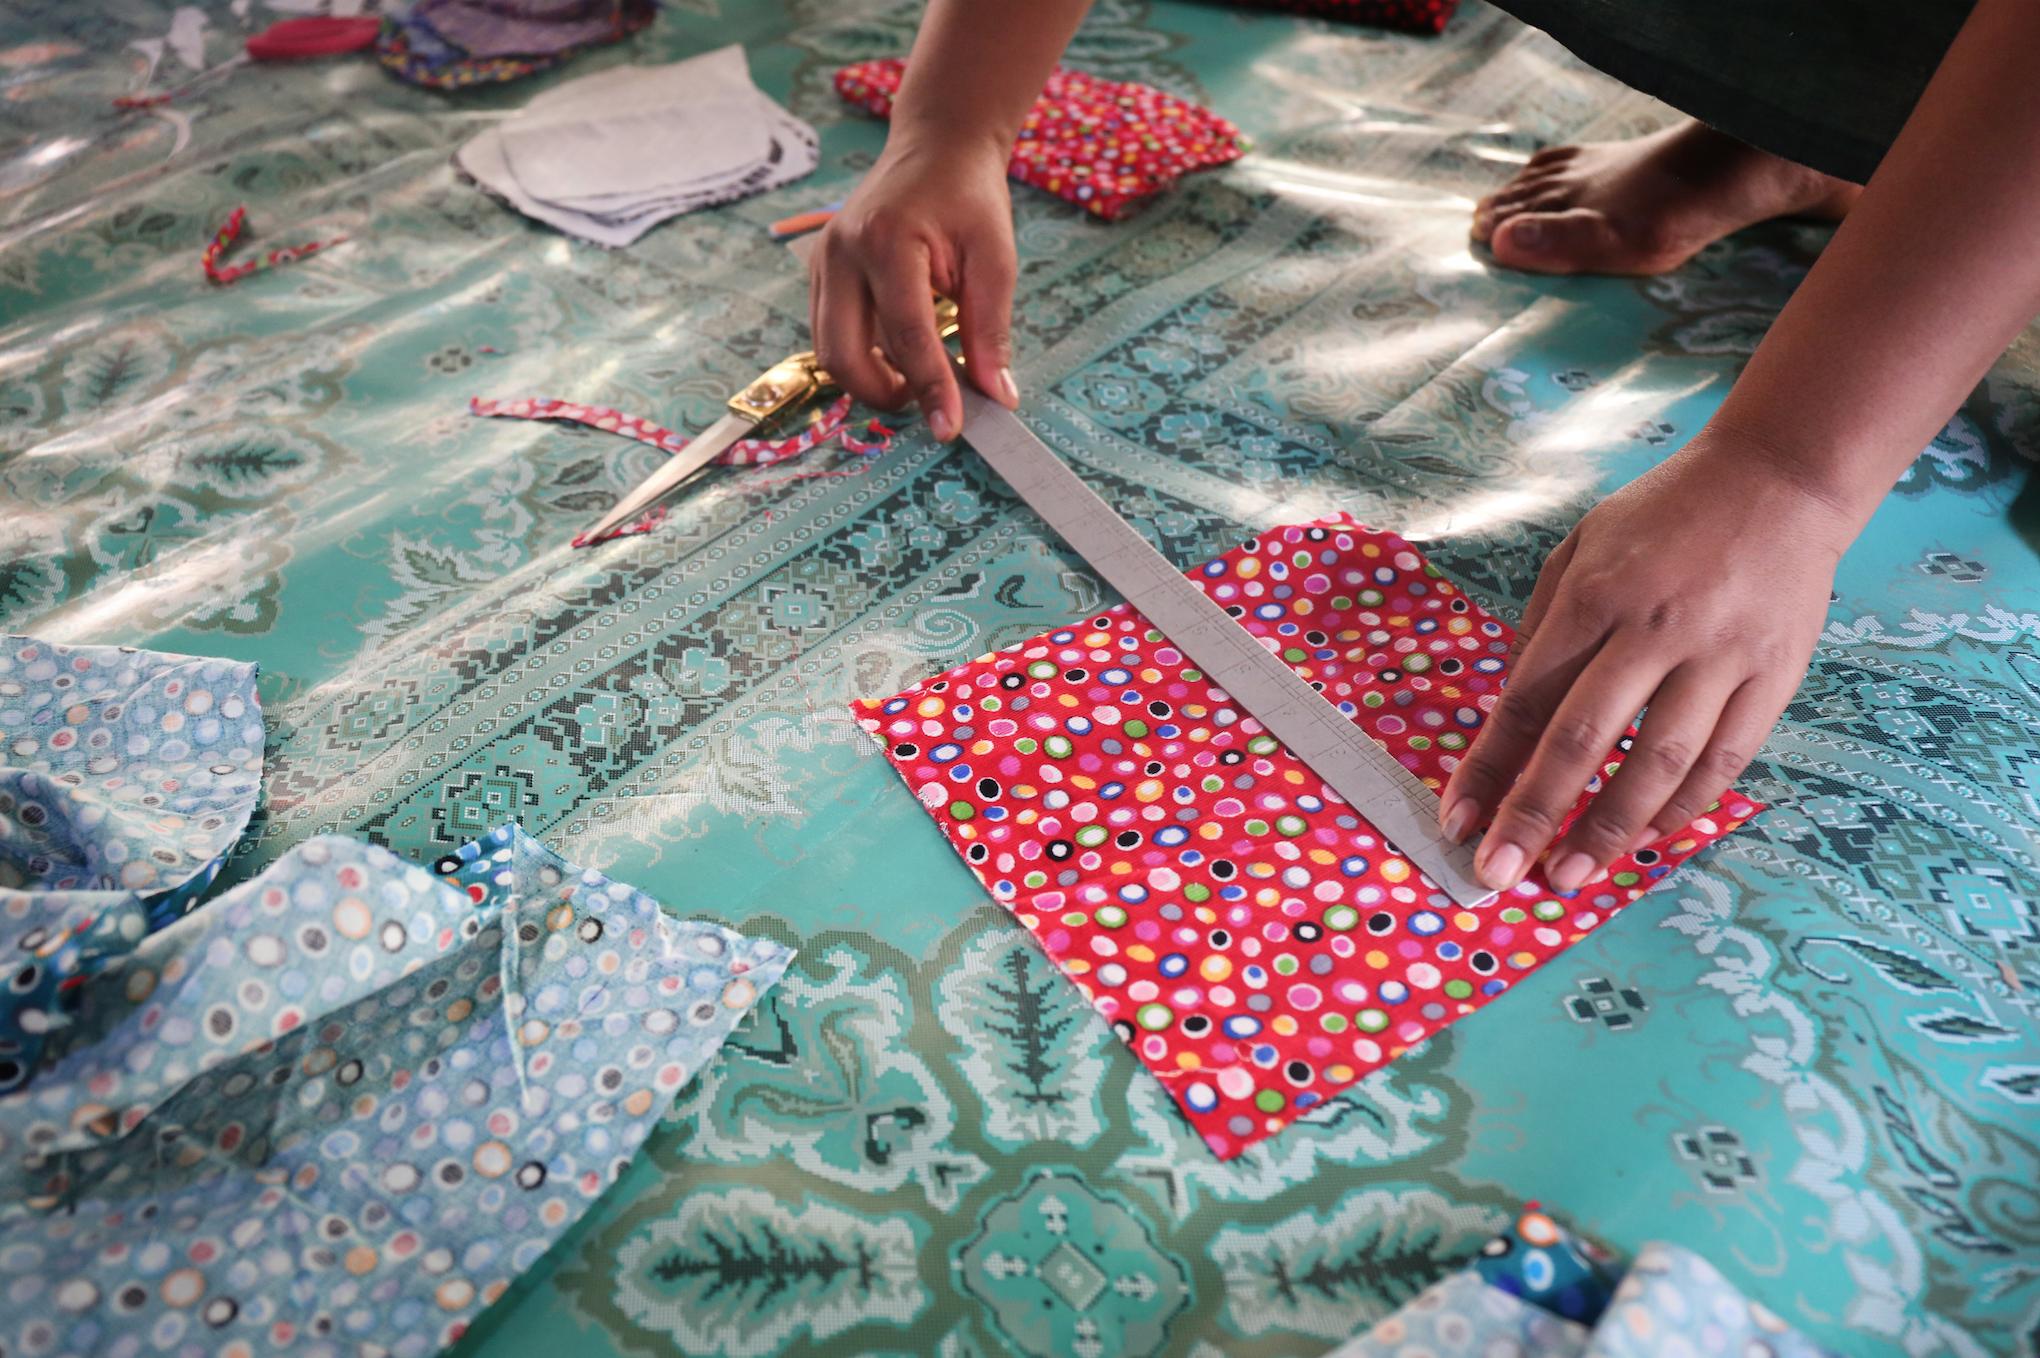 Women sew reusable menstrual pads. March 2018